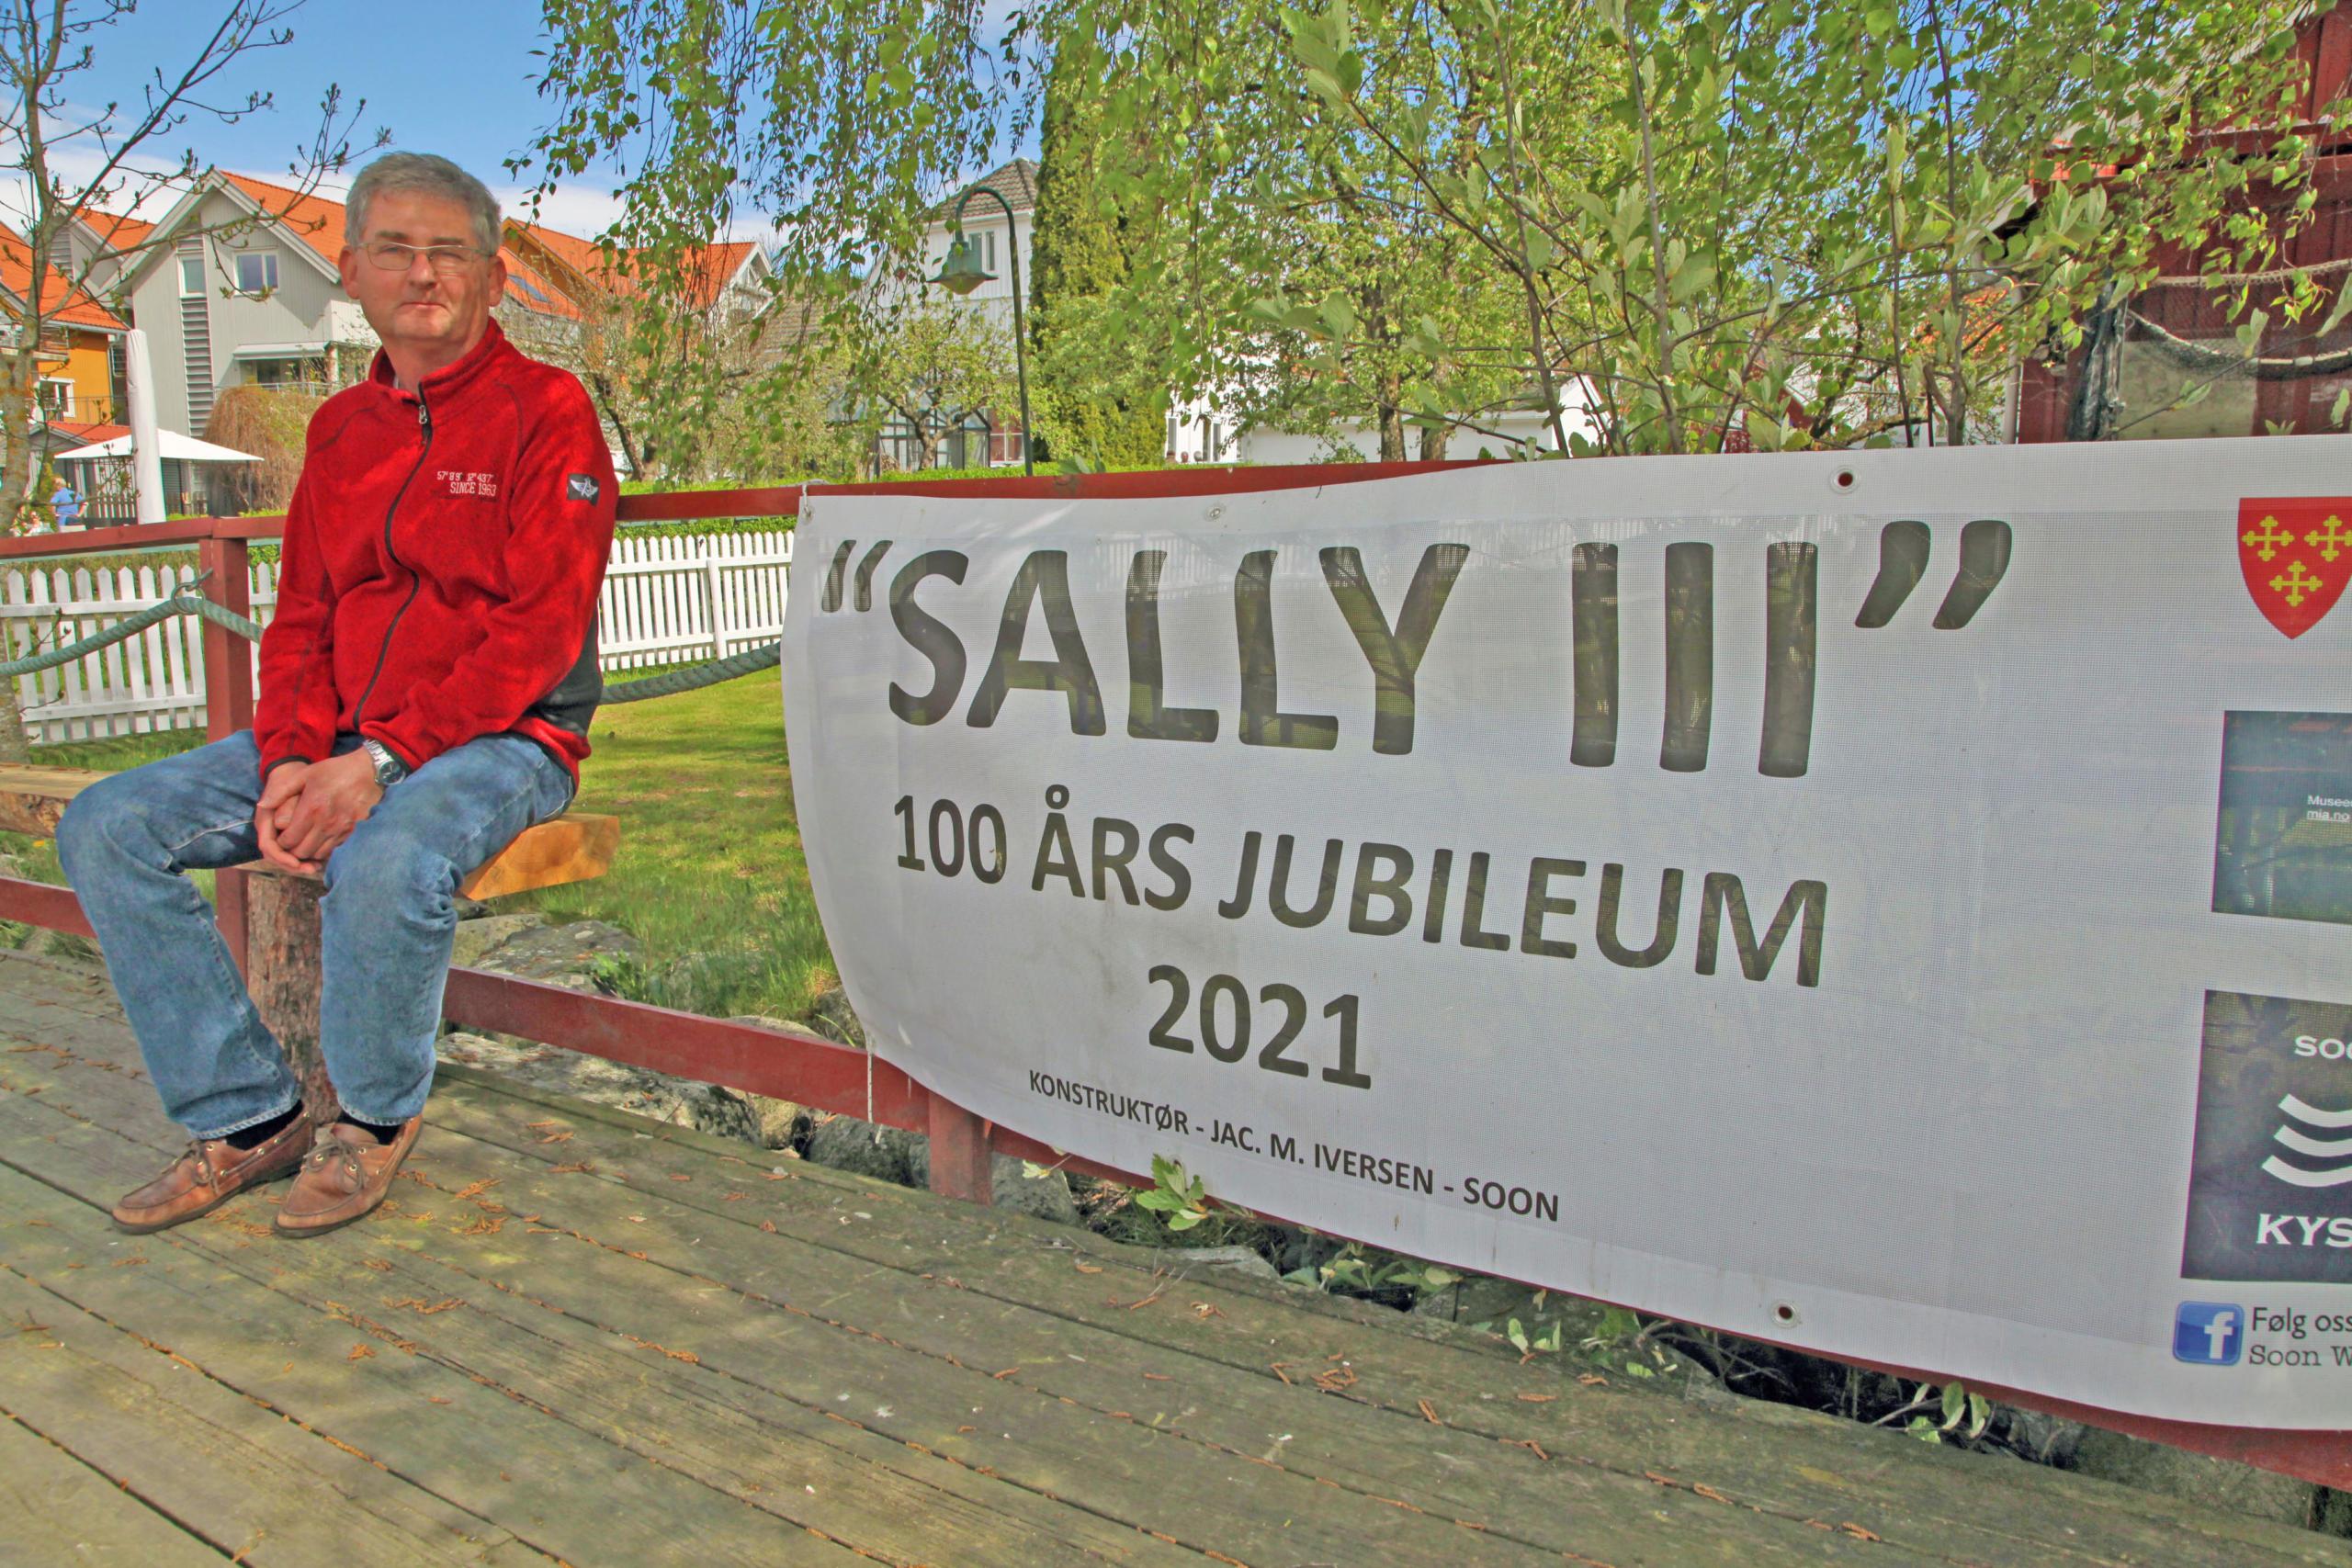 mann ved skilt der det står Sally III